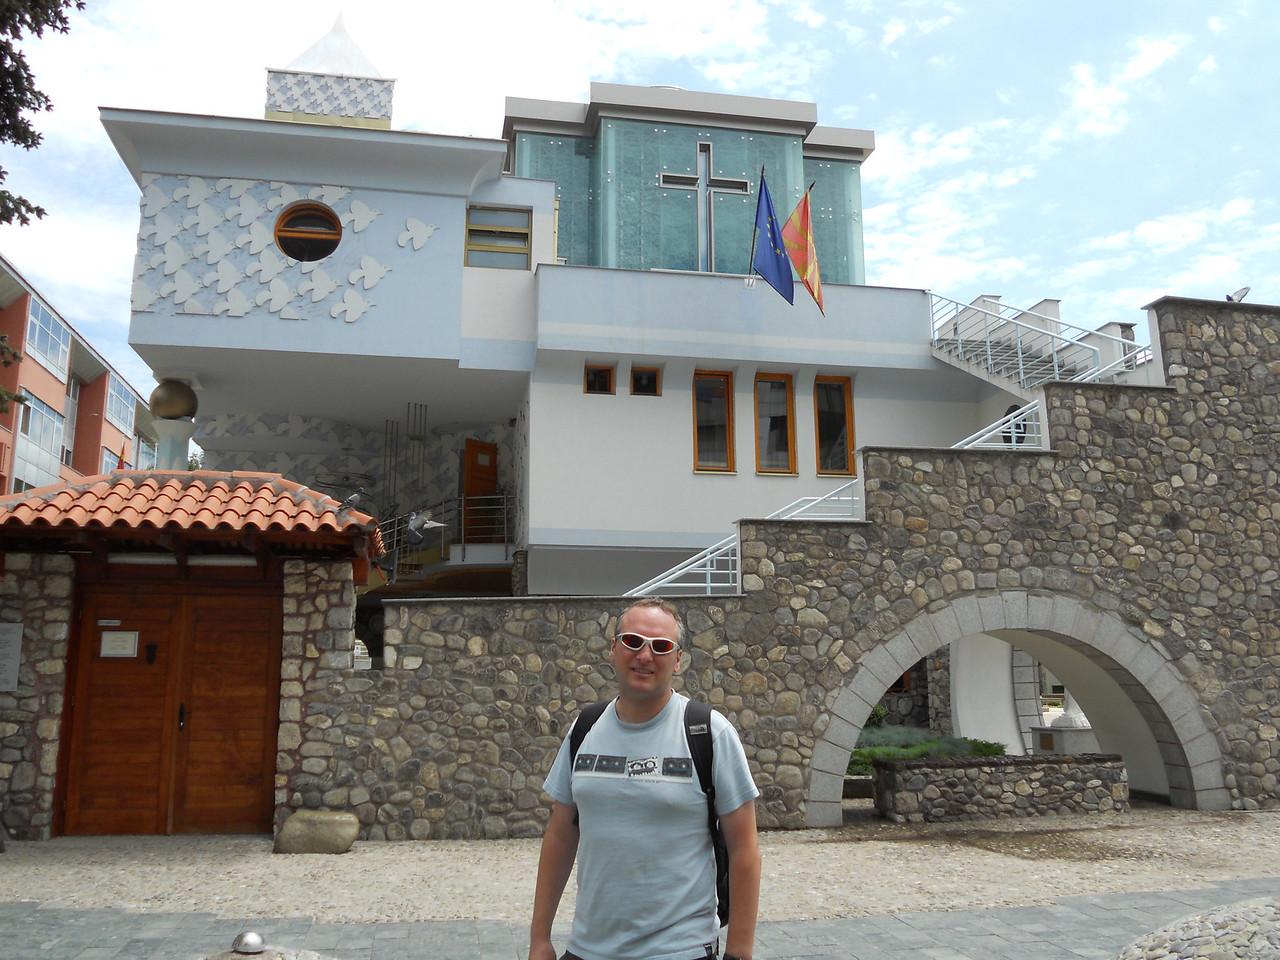 The very modern Mother Teresa church - she was born in Skopje.